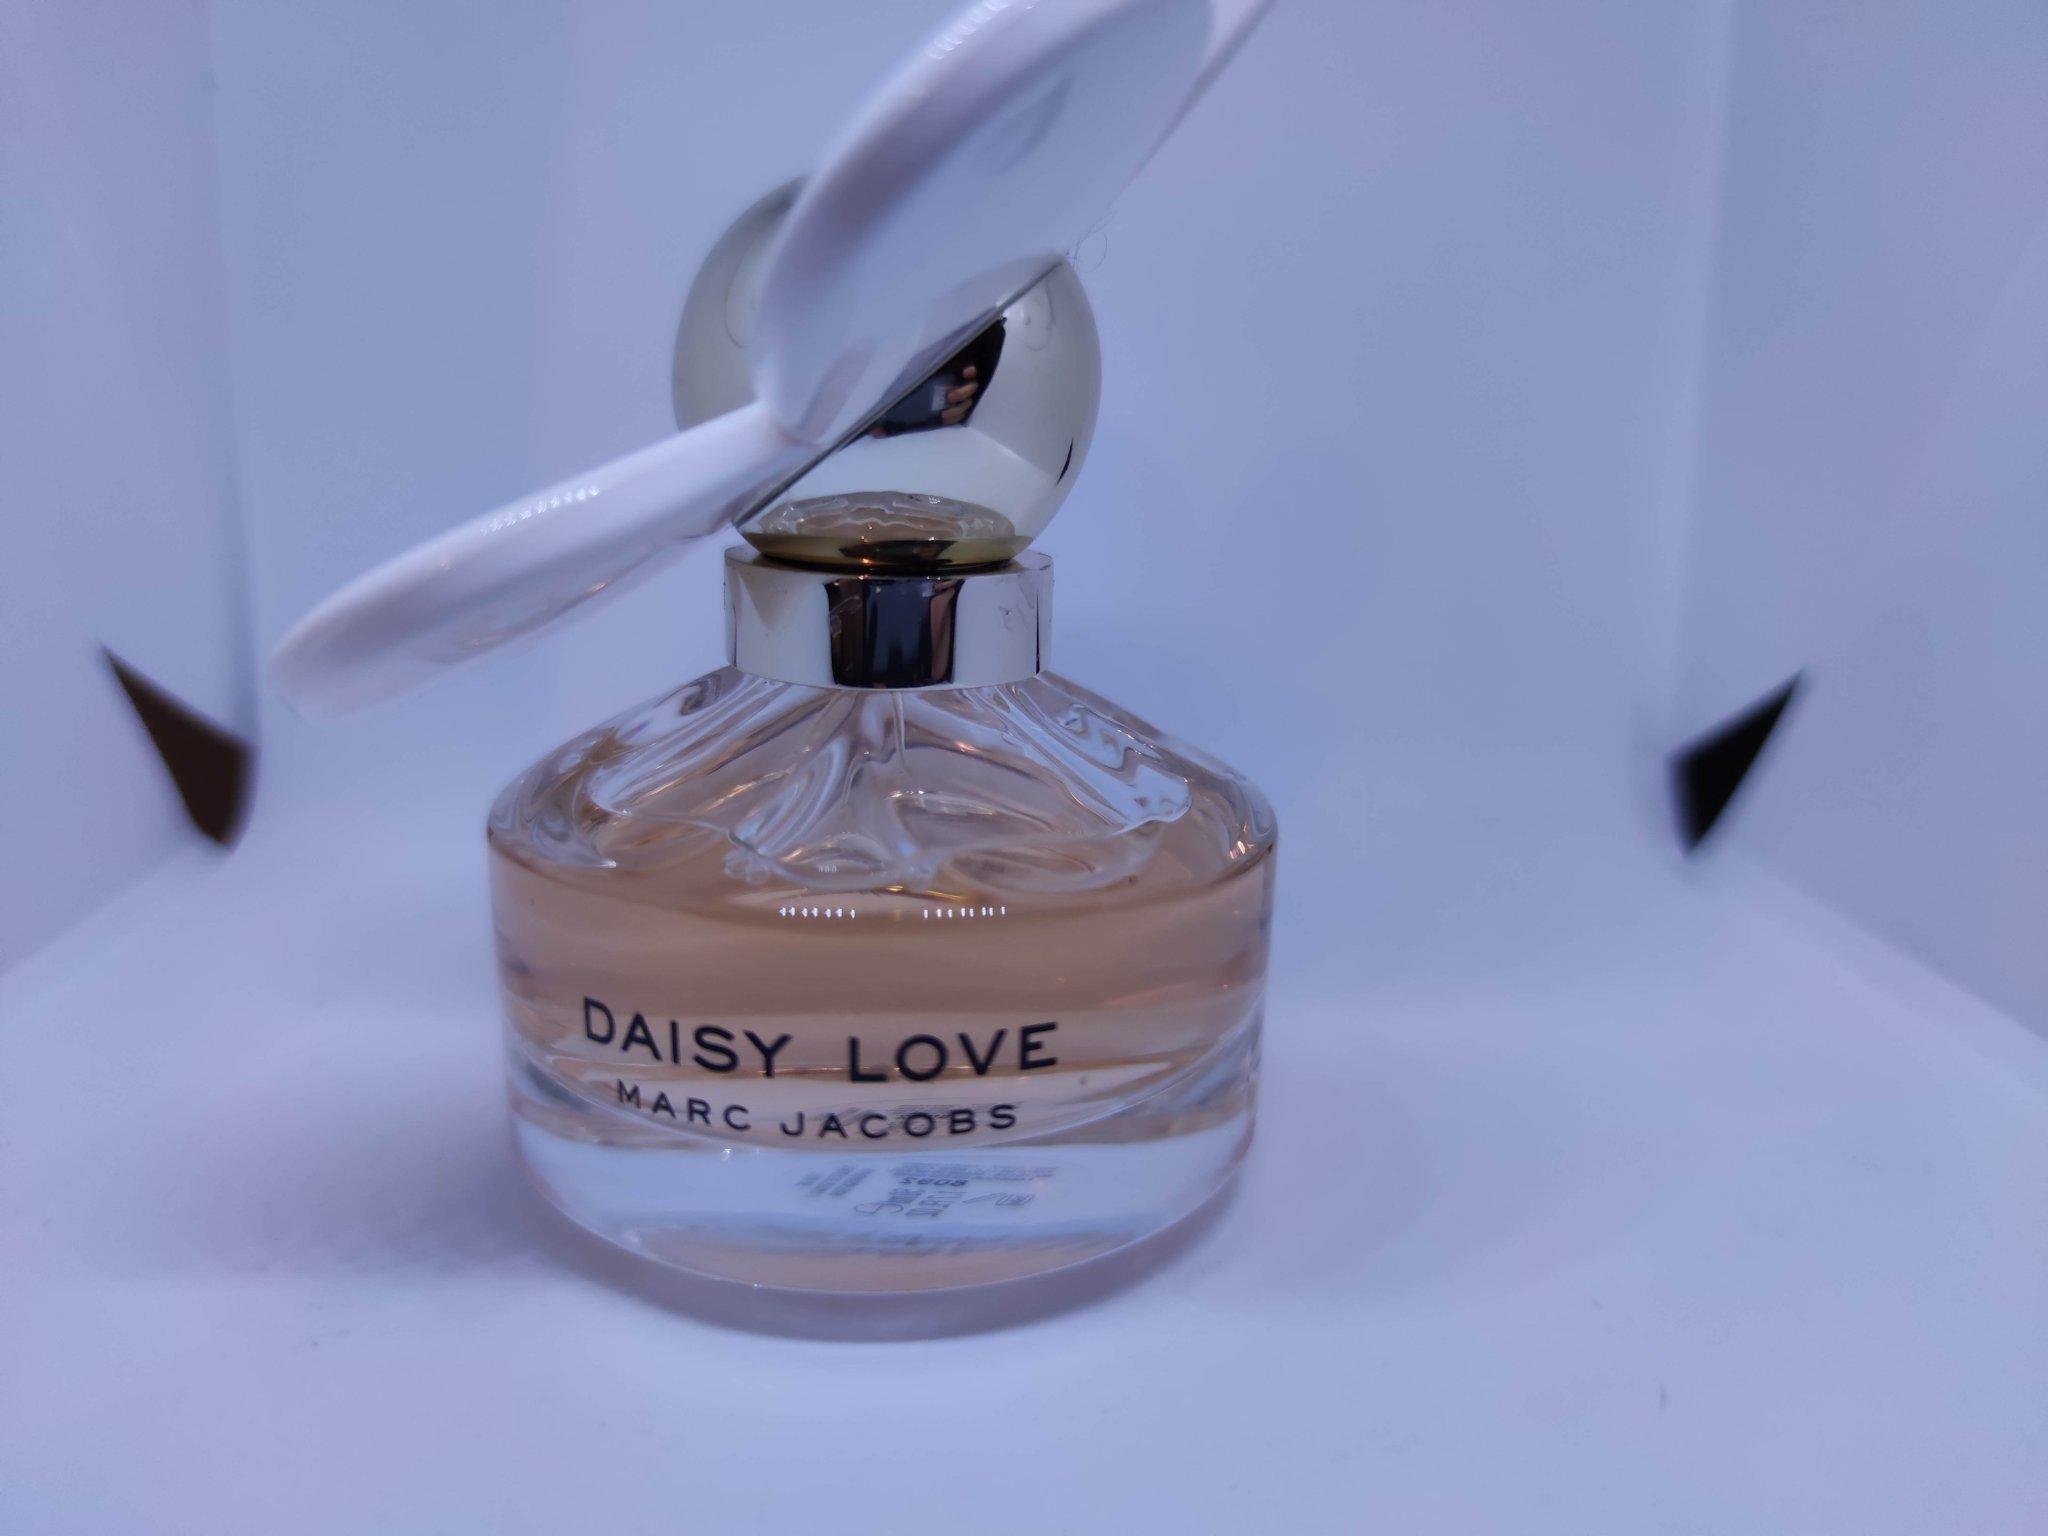 Parfym Marc Jacobs Daisy Love edt 50ml (426900955) ᐈ Köp på